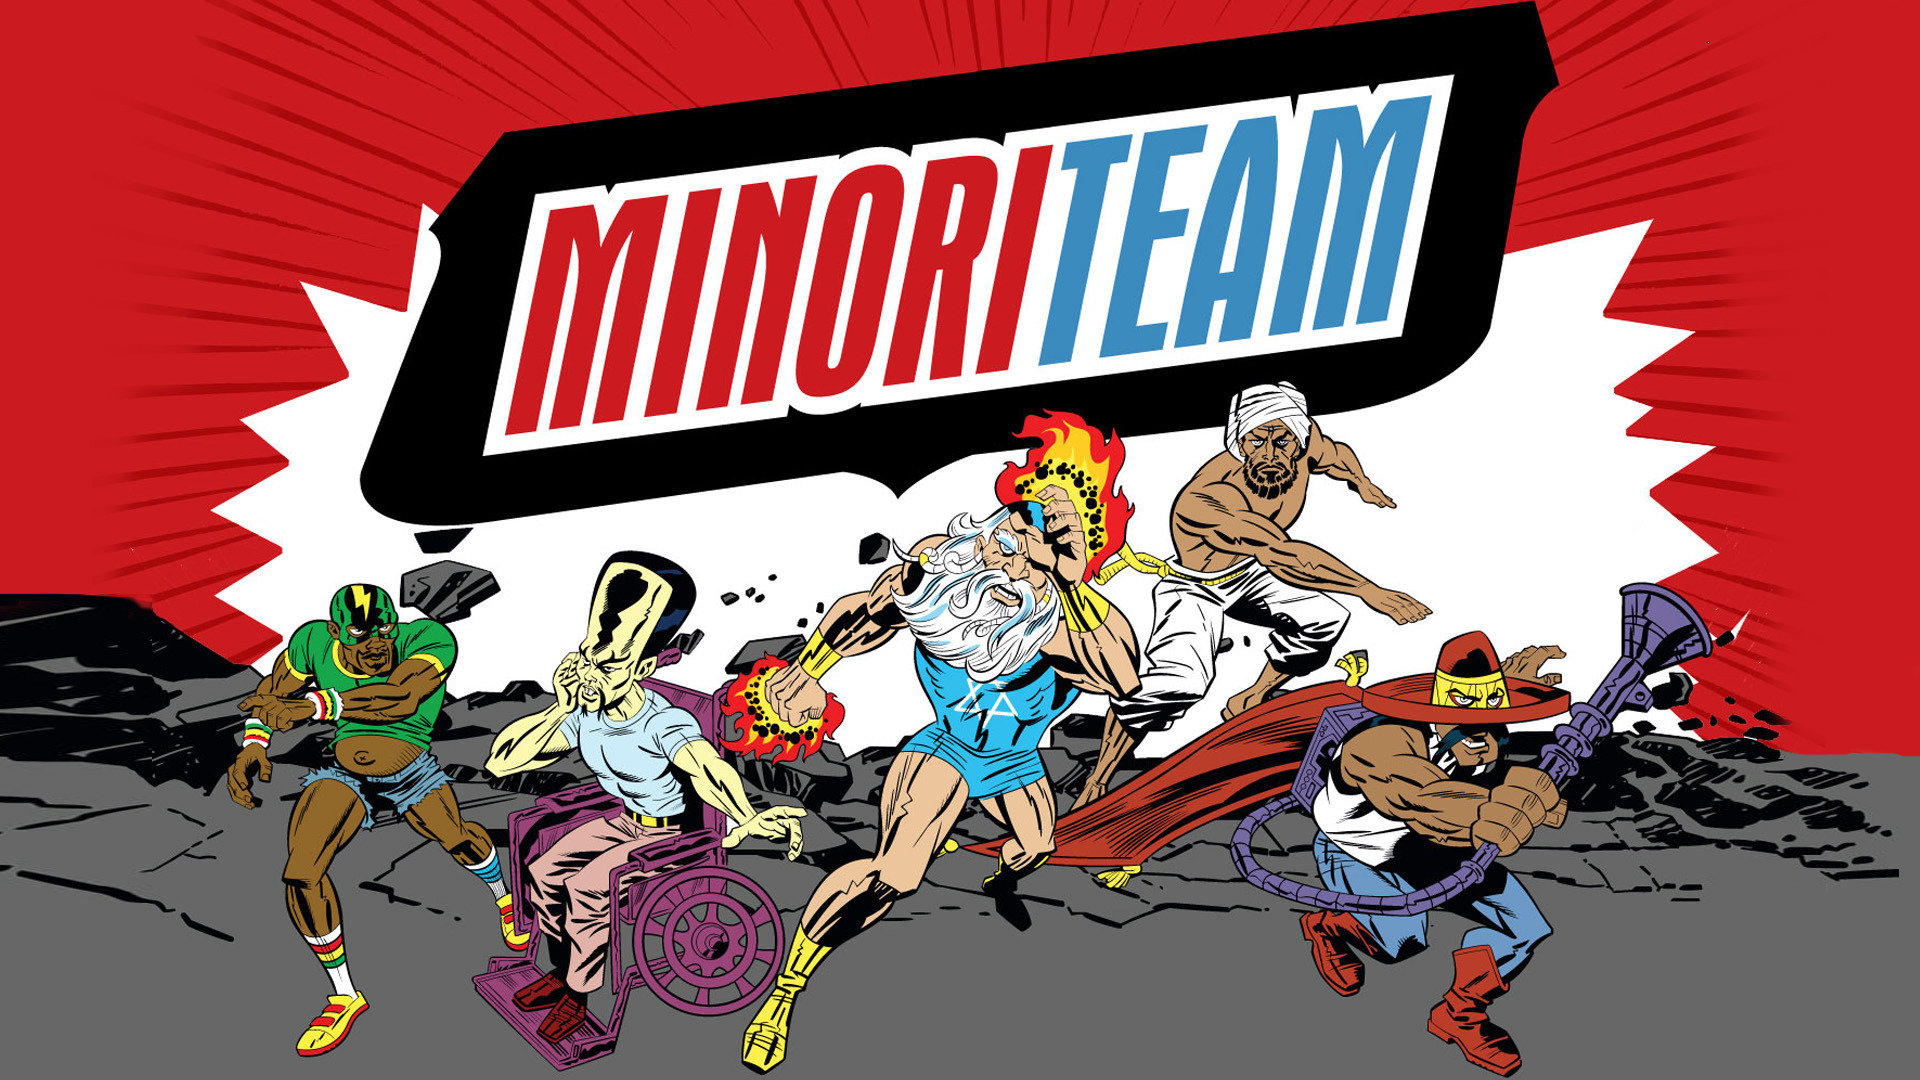 Cartoon Minoriteam